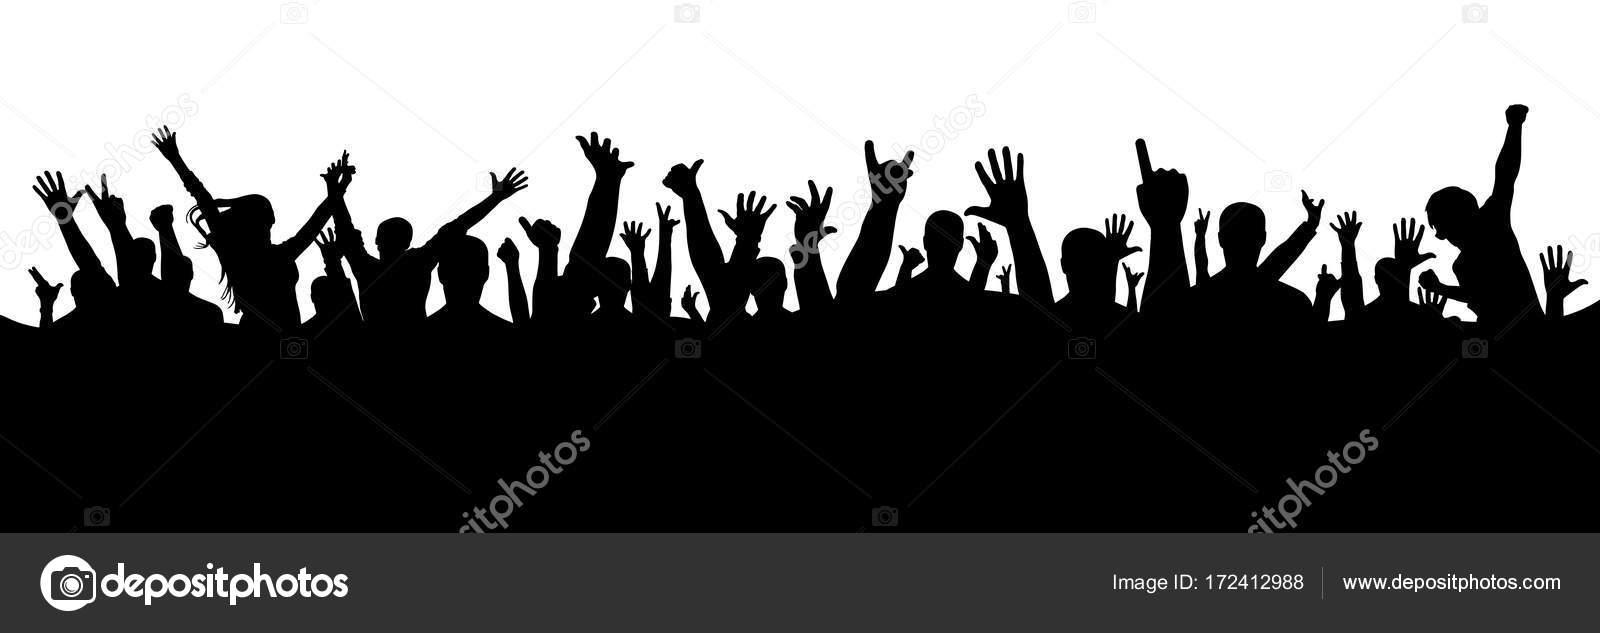 Multitud De Gente Silueta: Mano Multitud Silueta, Vector